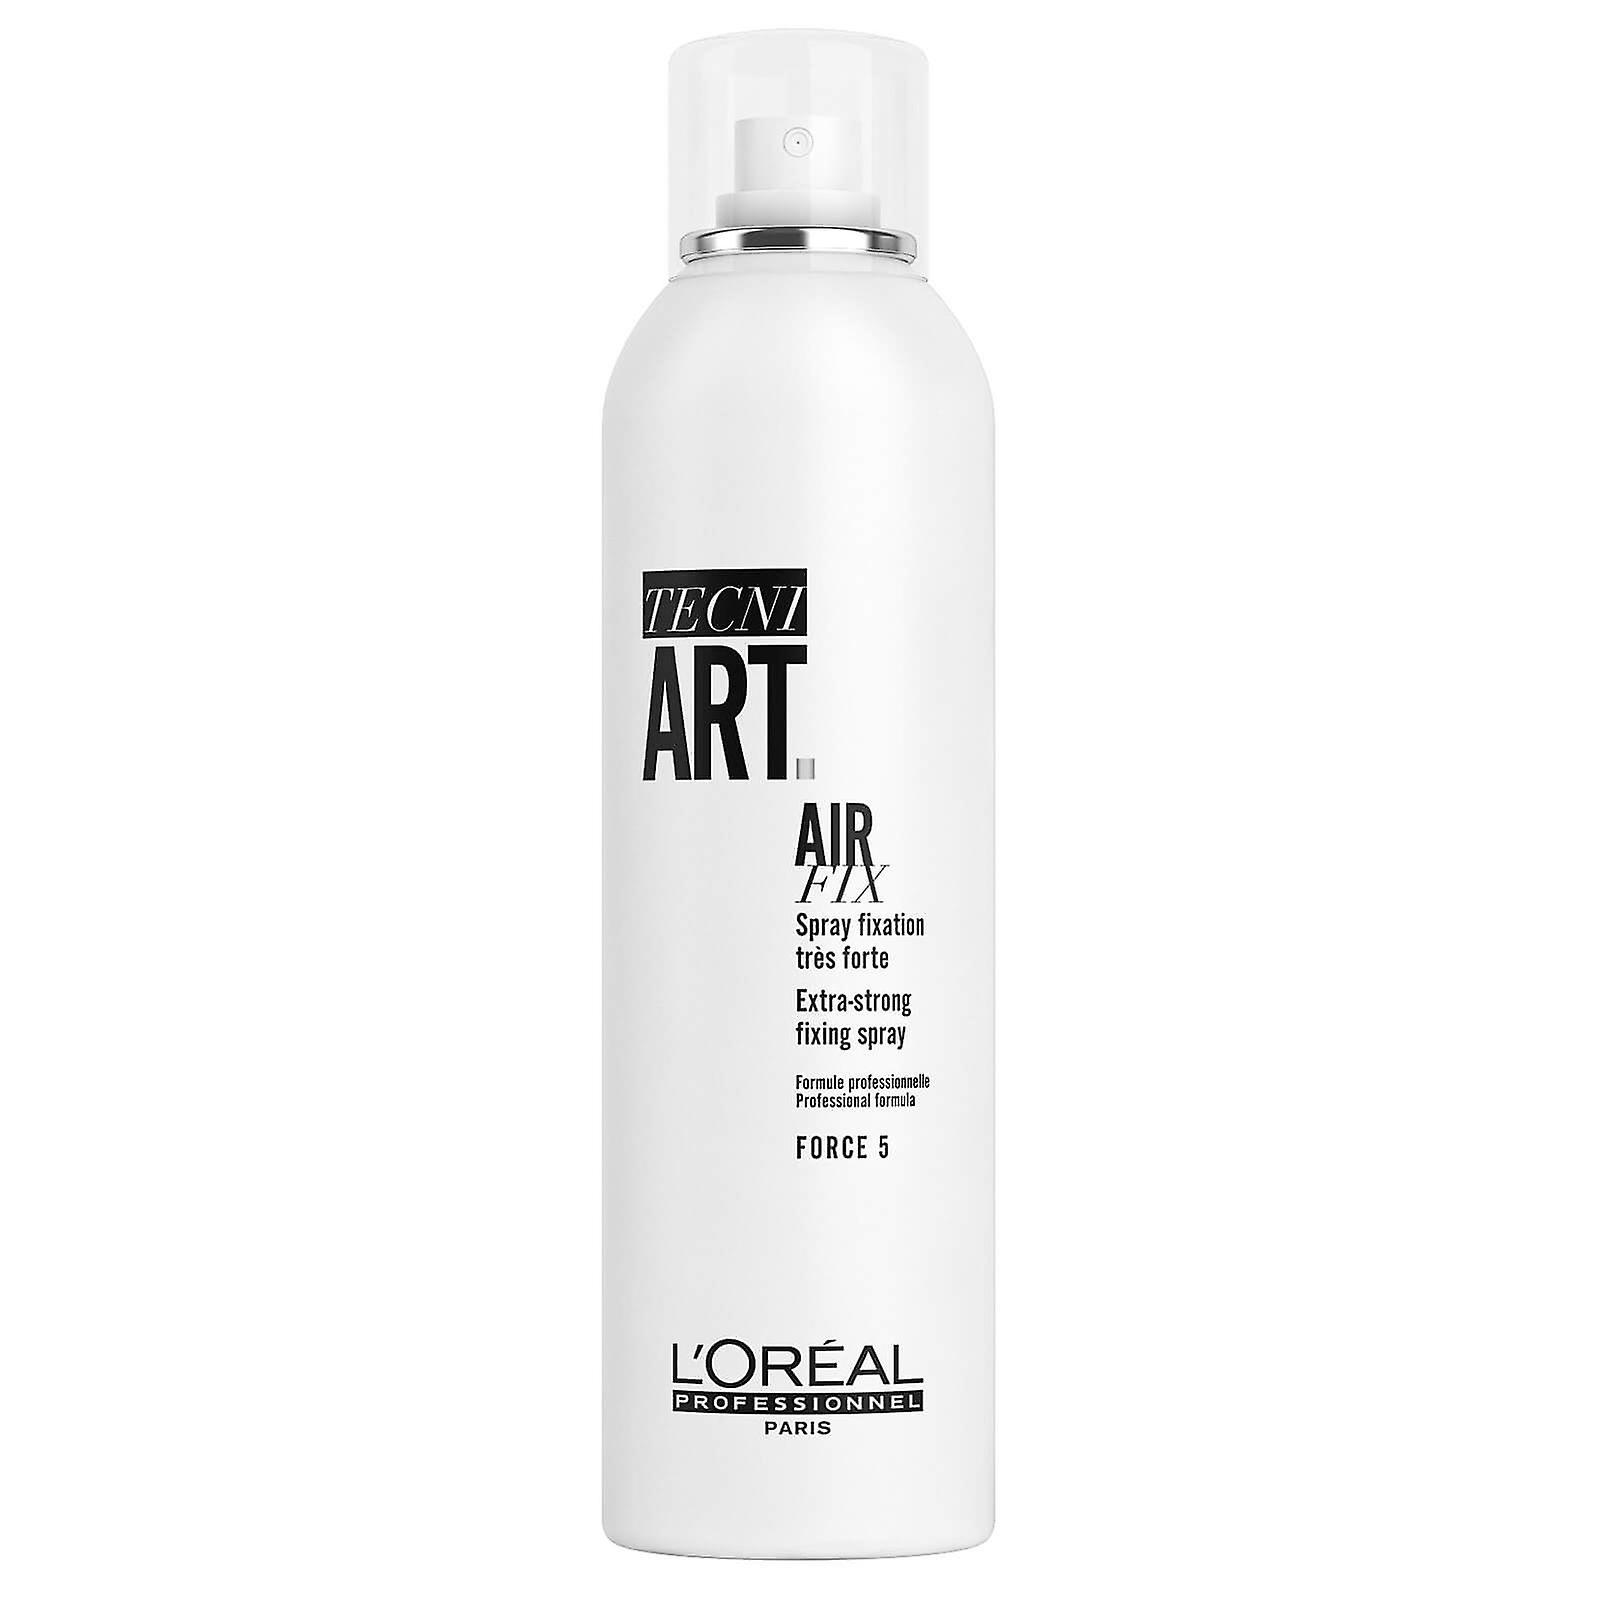 L'Oreal Tecni Art Air Fix 250ml